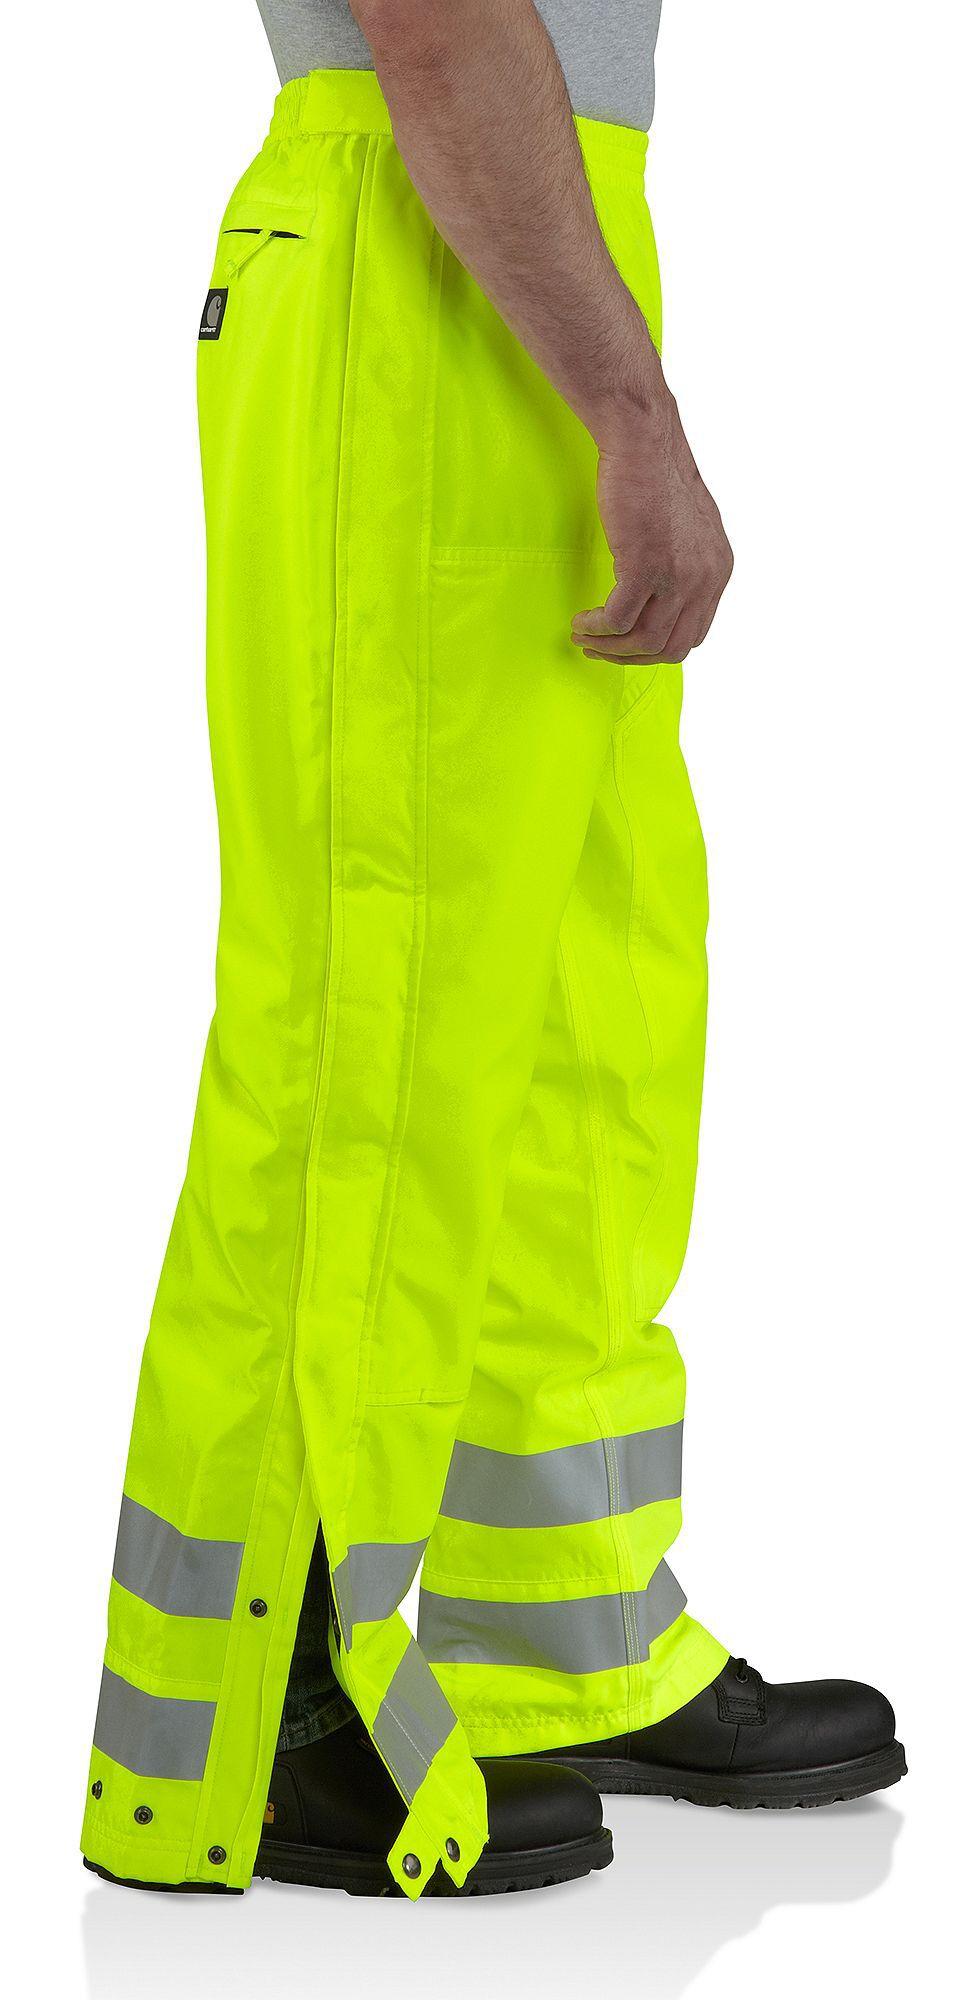 Carhartt High-Visibility Class E Waterproof Pants, Lime, hi-res